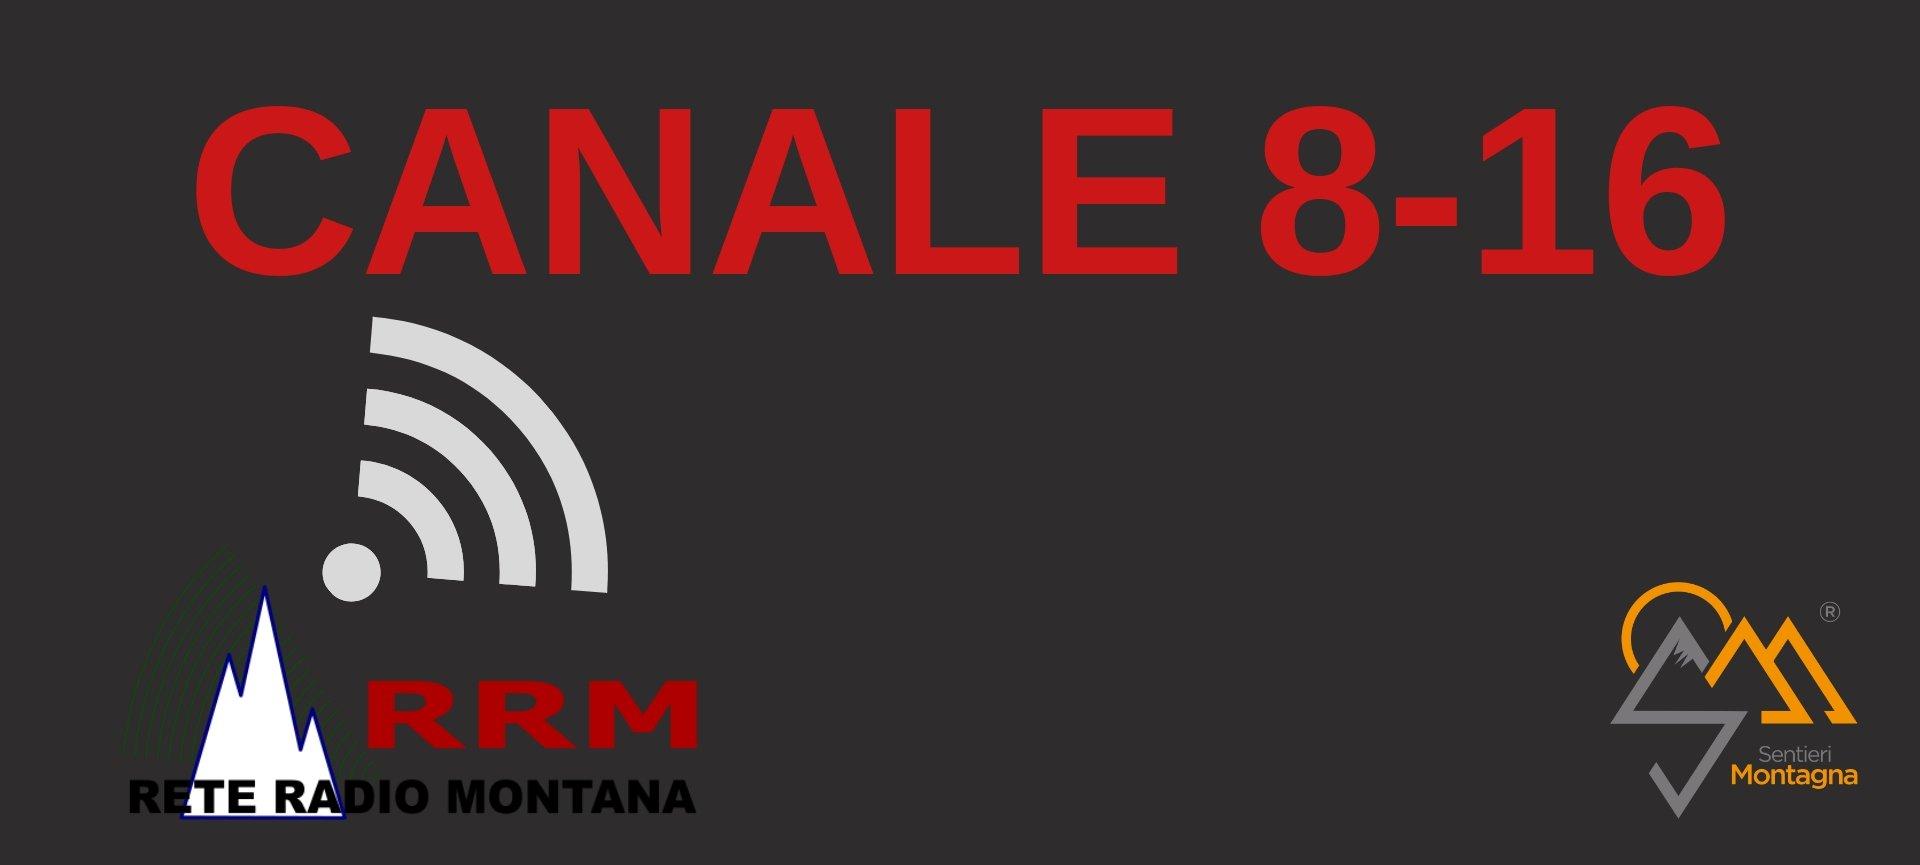 frequenza rete radio montana